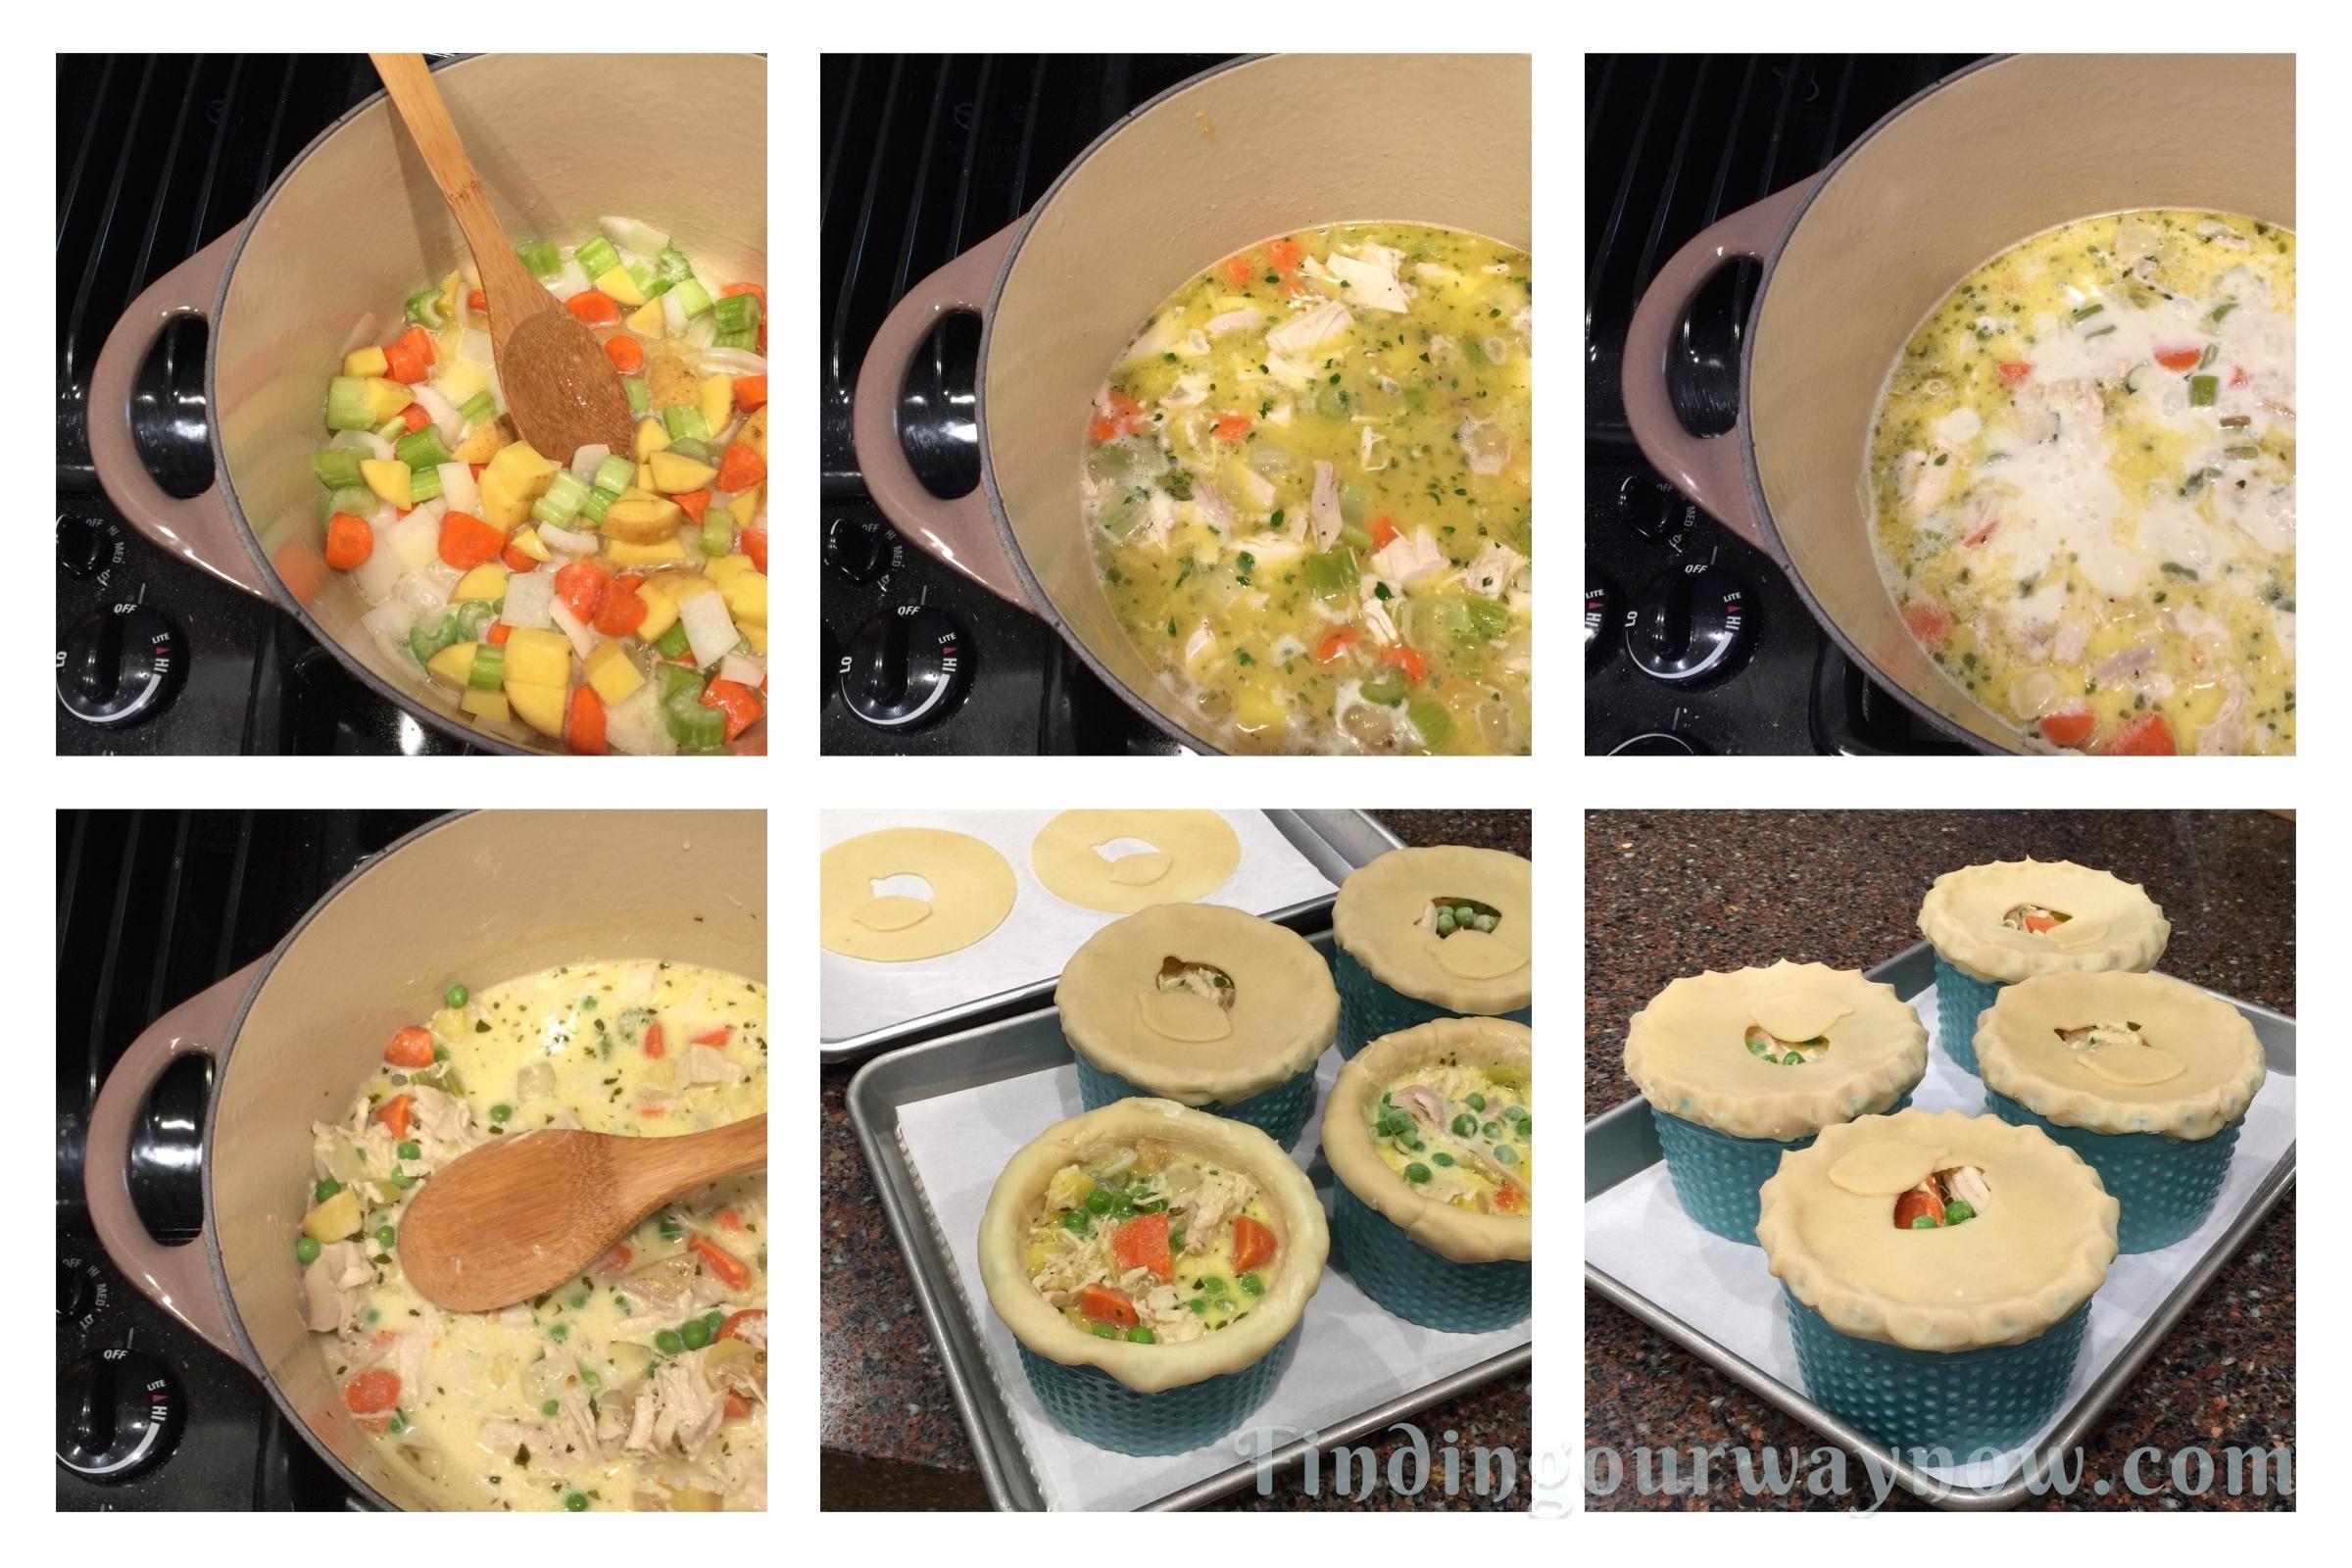 Individual Chicken Pot Pies, findingourwaynow.com